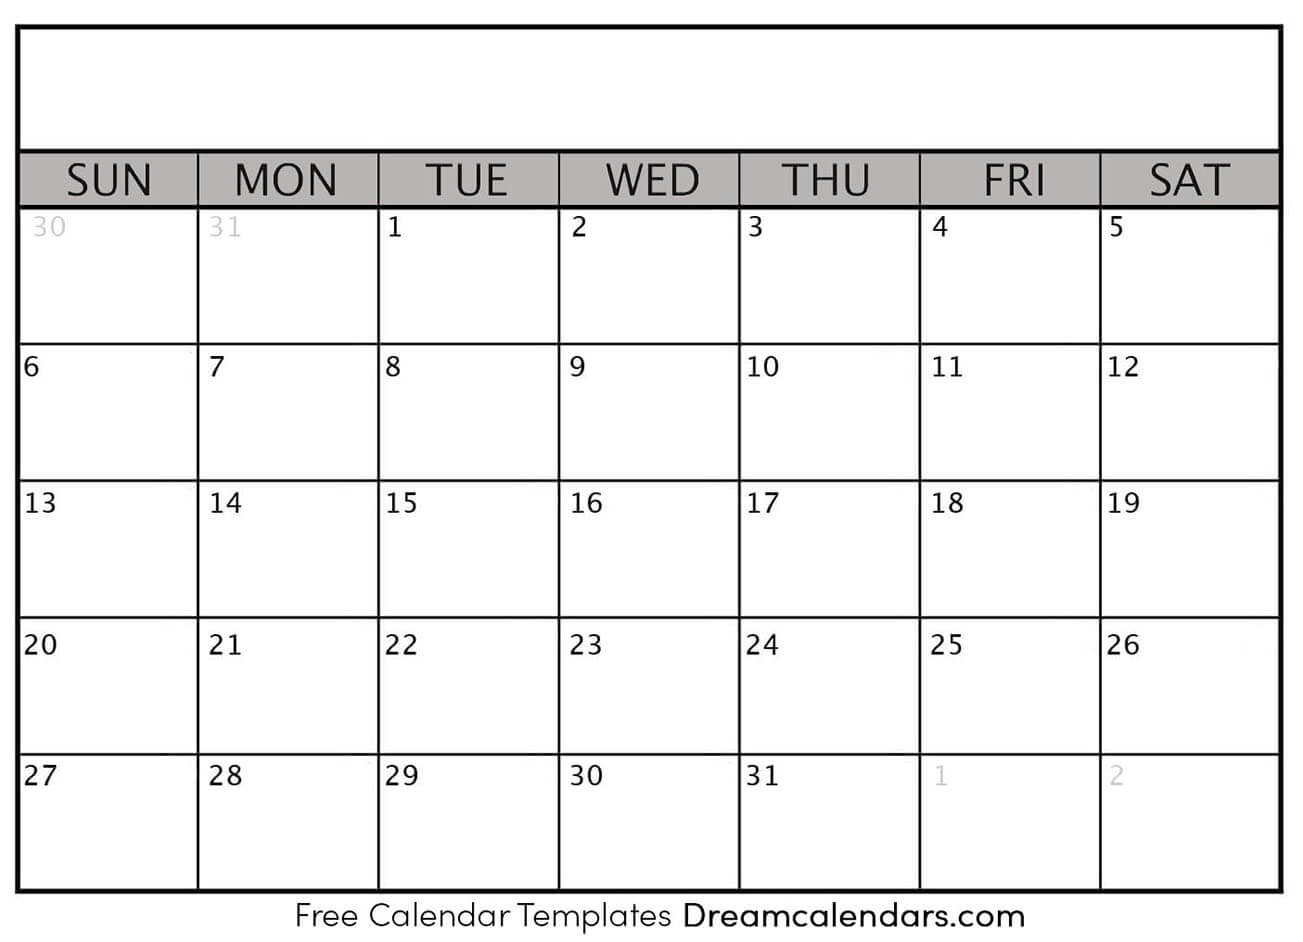 Printable Blank Calendar 2020 | Dream Calendars  Free Printable Editable Calendars 2020